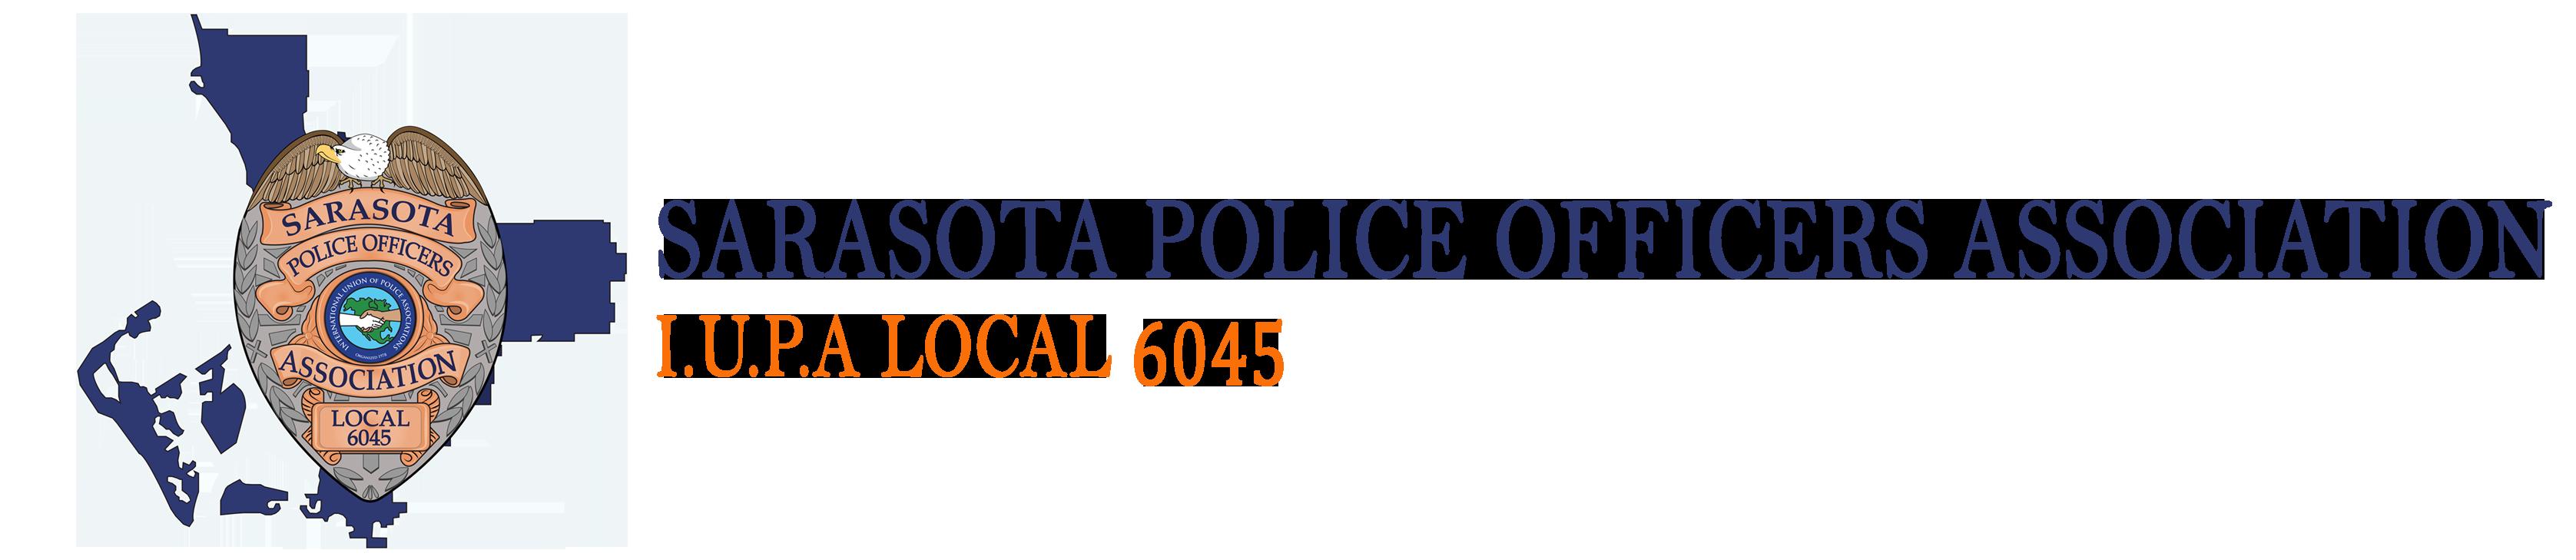 Sarasota Police Officers Association Local 6045